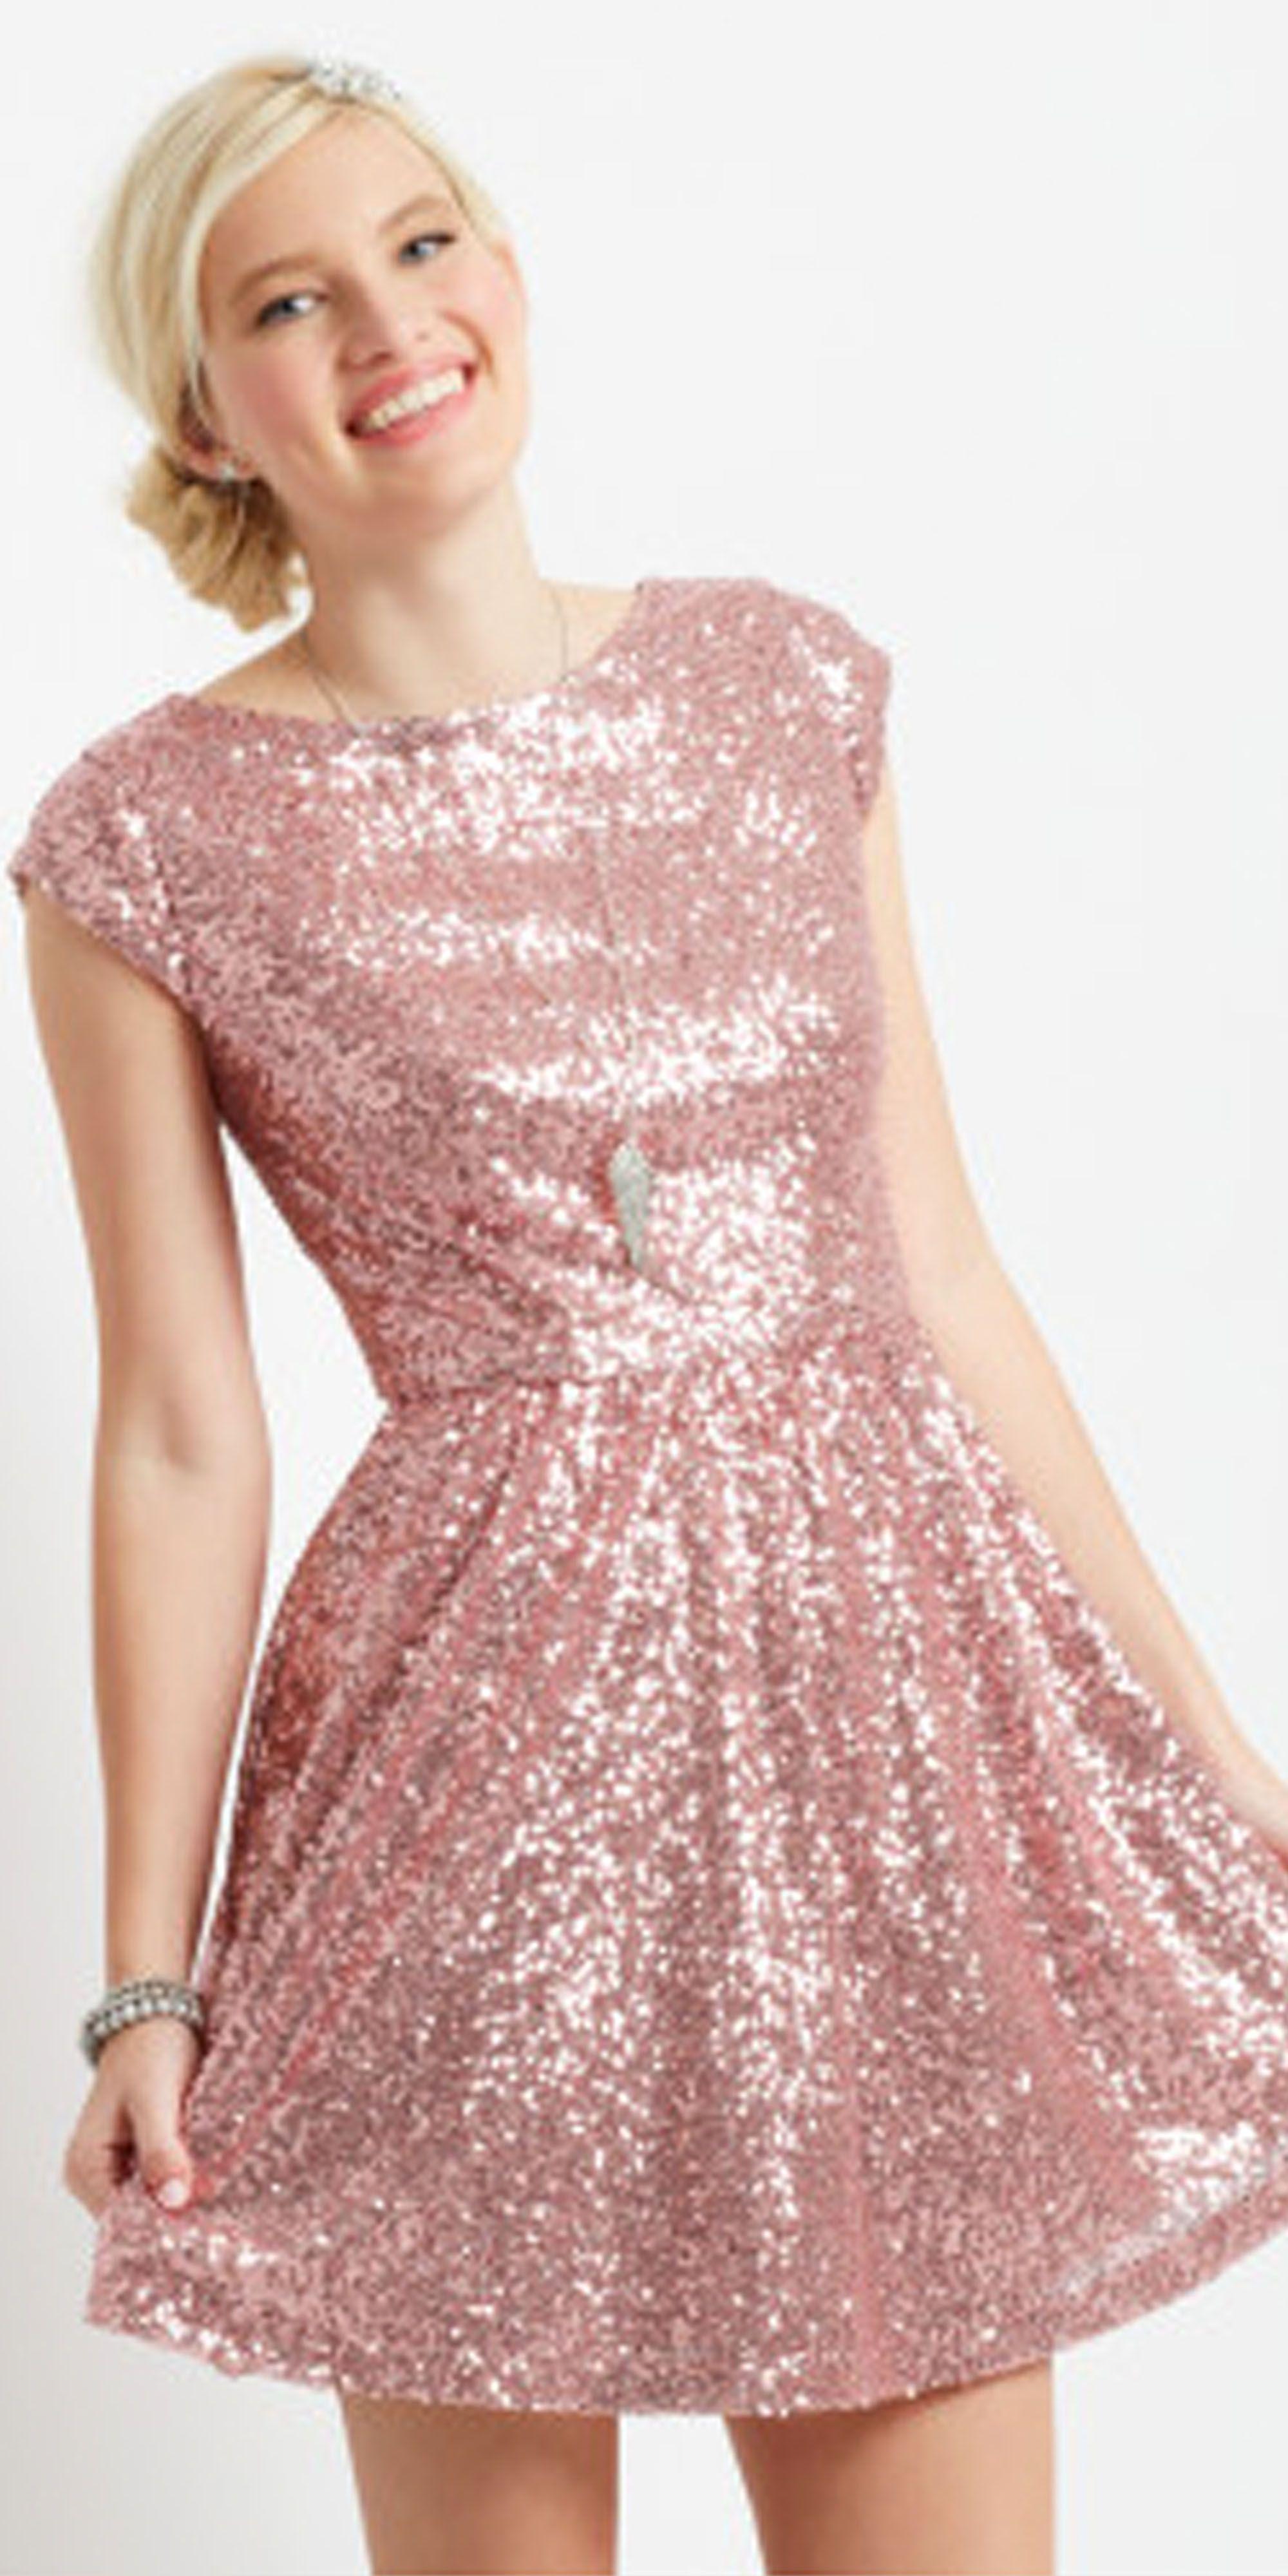 12 Gorgeous Prom Dresses Under 100 Dresses Prom Dresses Under 100 Cute Prom Dresses